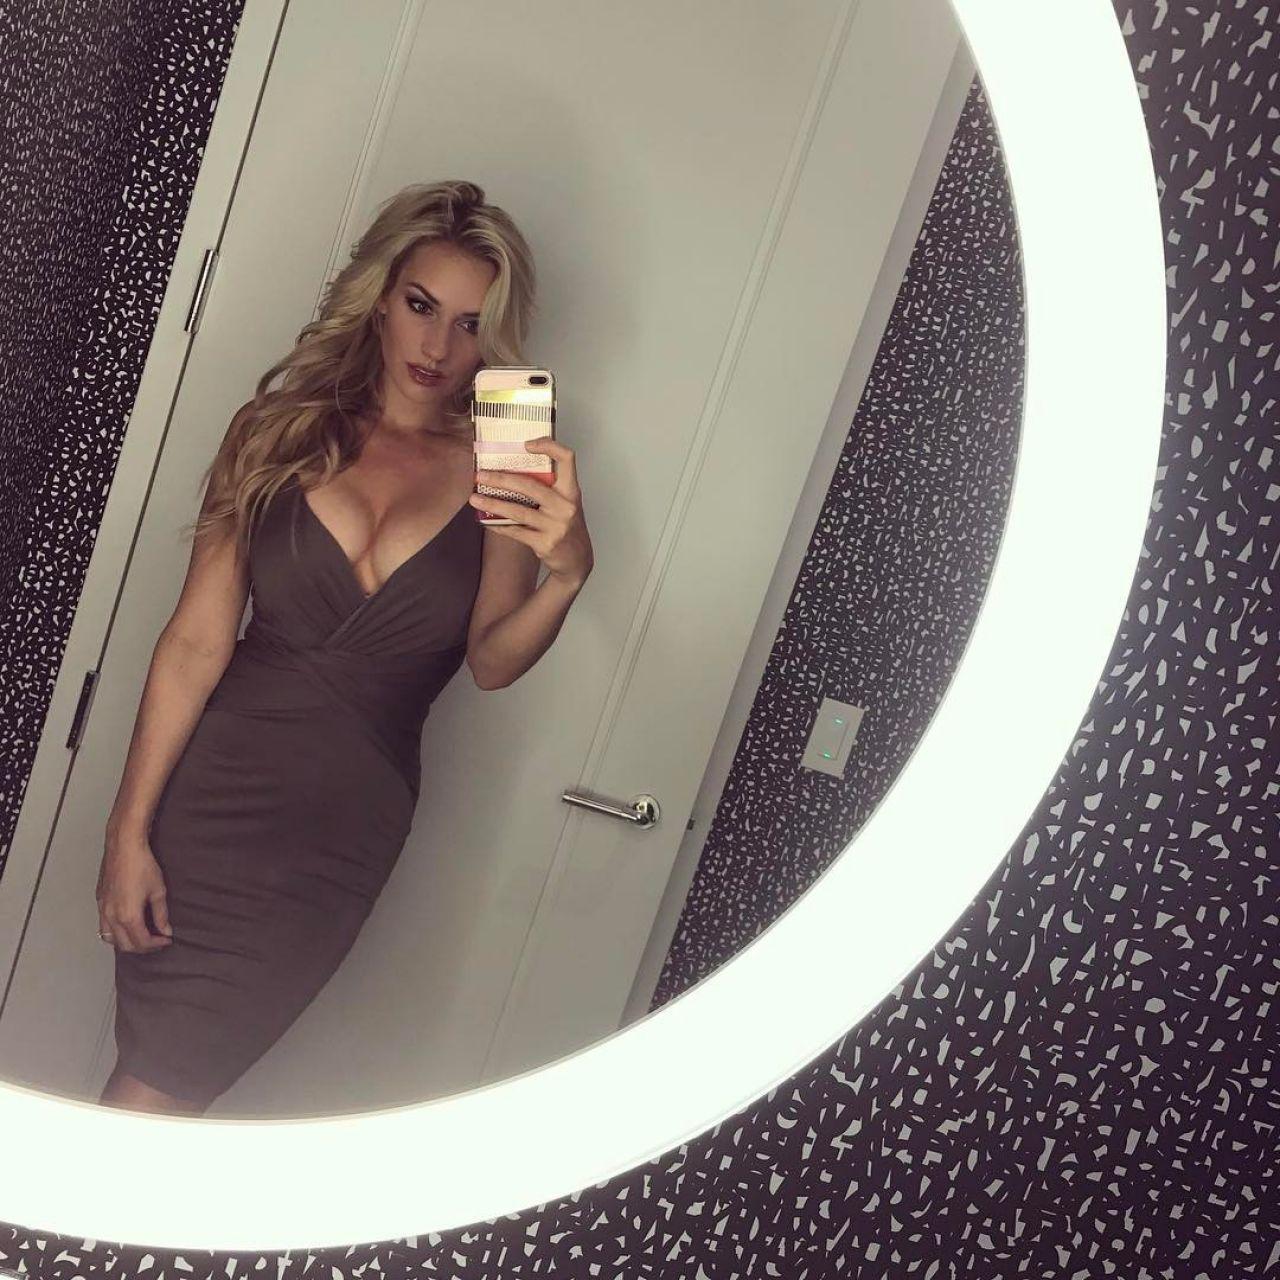 Paige Spiranac Social Media Pics May 2017